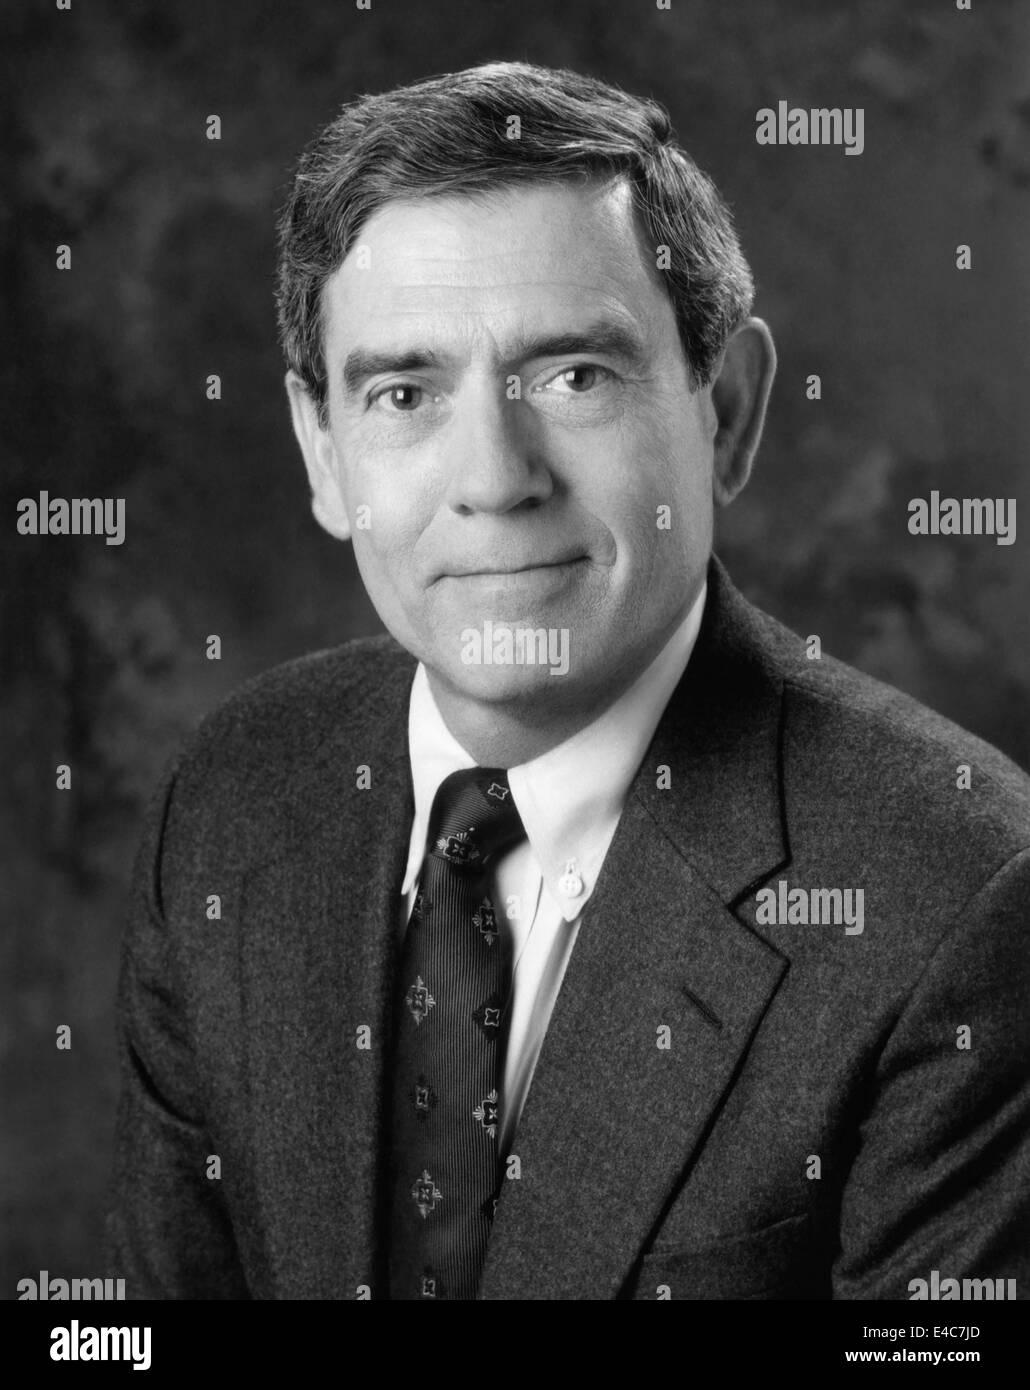 Dan Rather, American Journalist, Portrait, circa 1992 - Stock Image